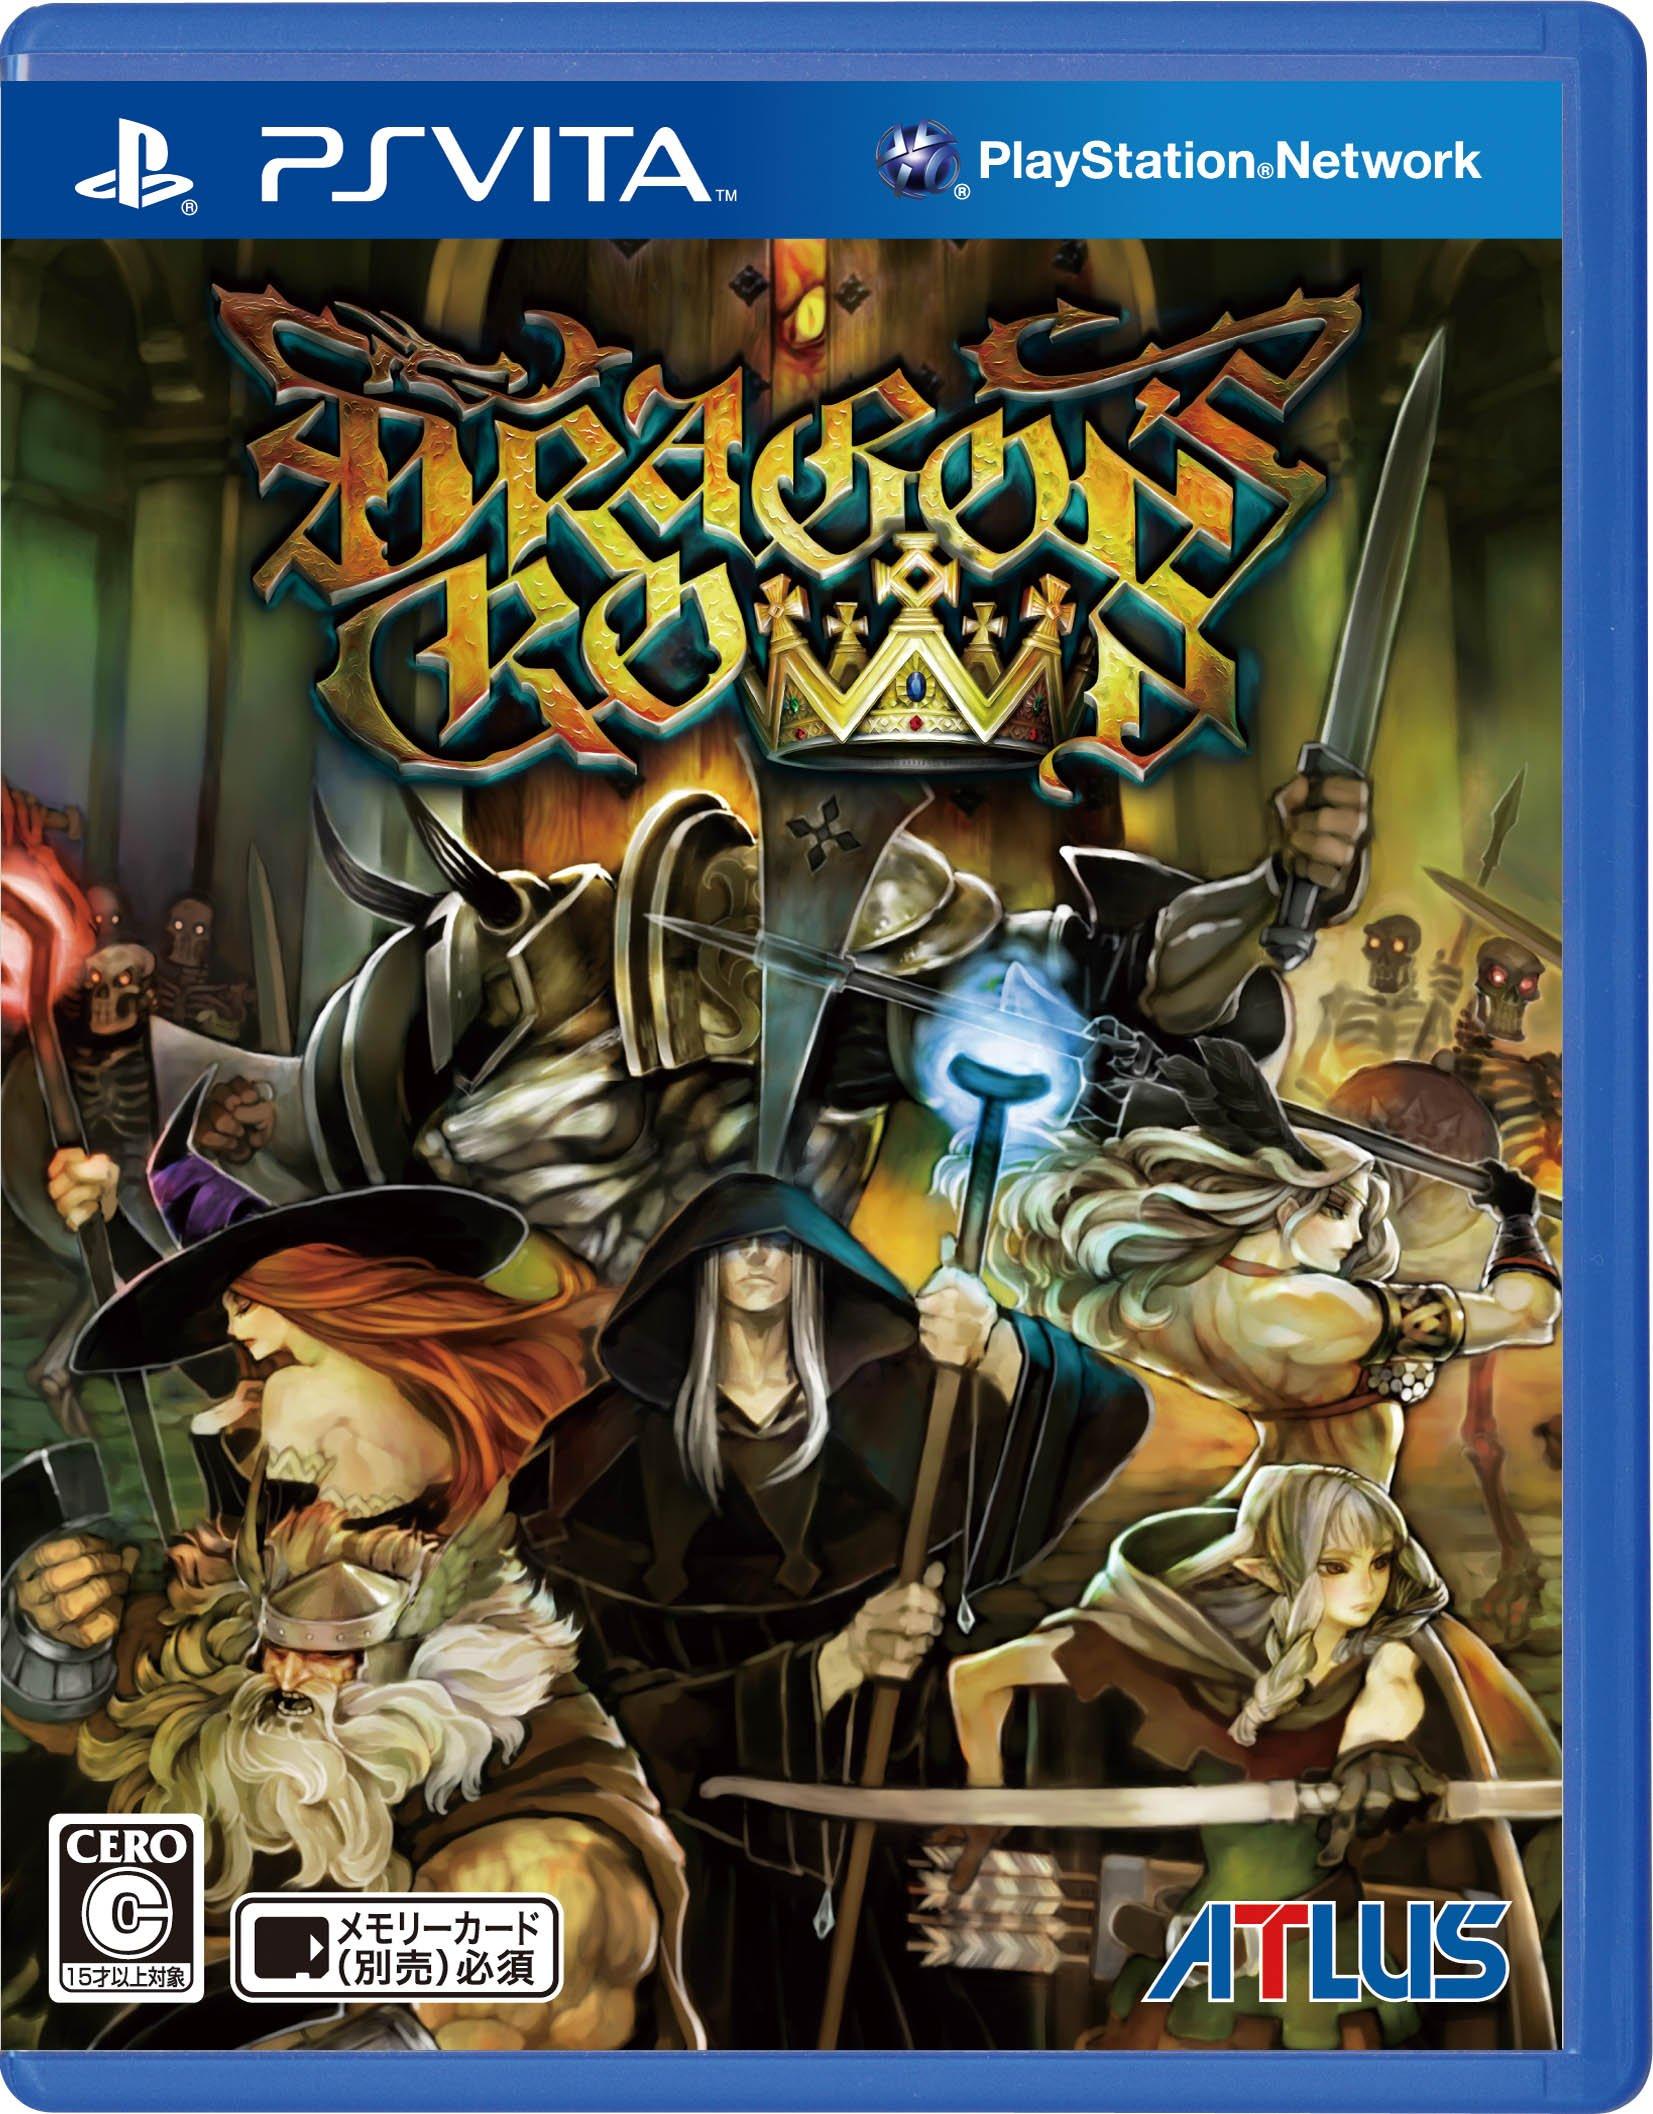 Dragons Crown limited quantities privilege artwork book ''Dragon's Crown Art Works''